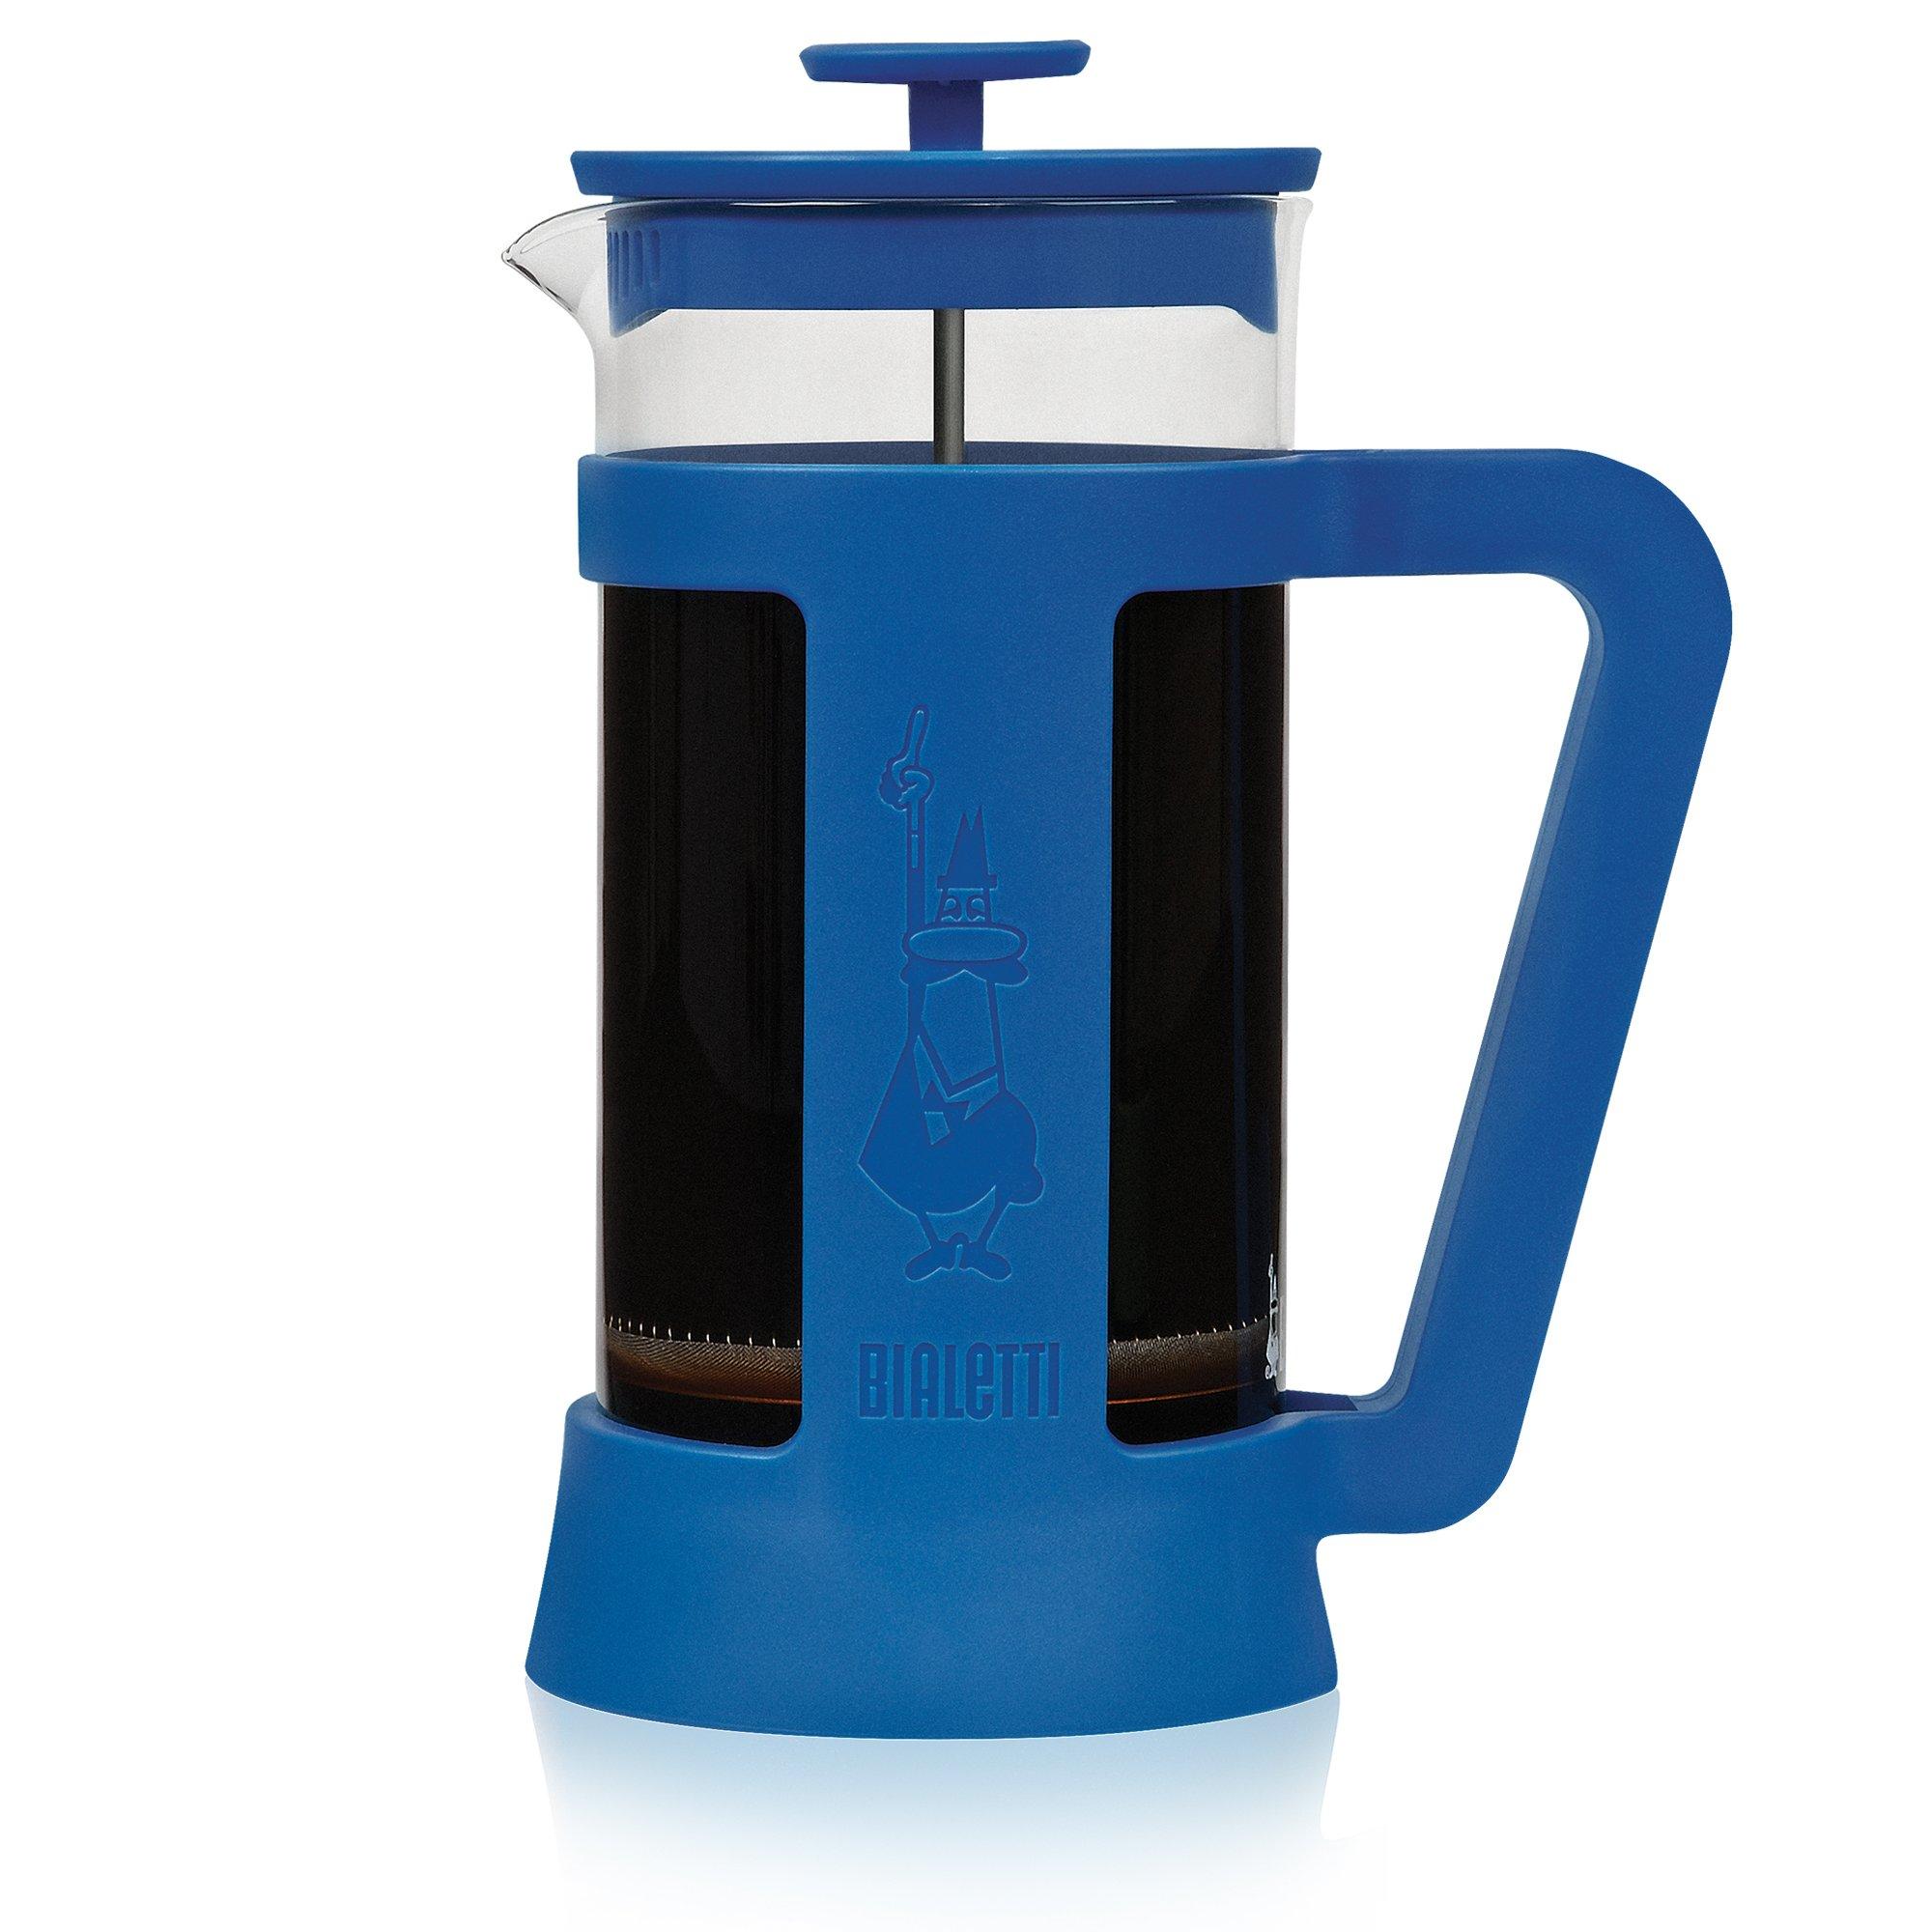 Bialetti 06643 Modern Coffee Press, Blue